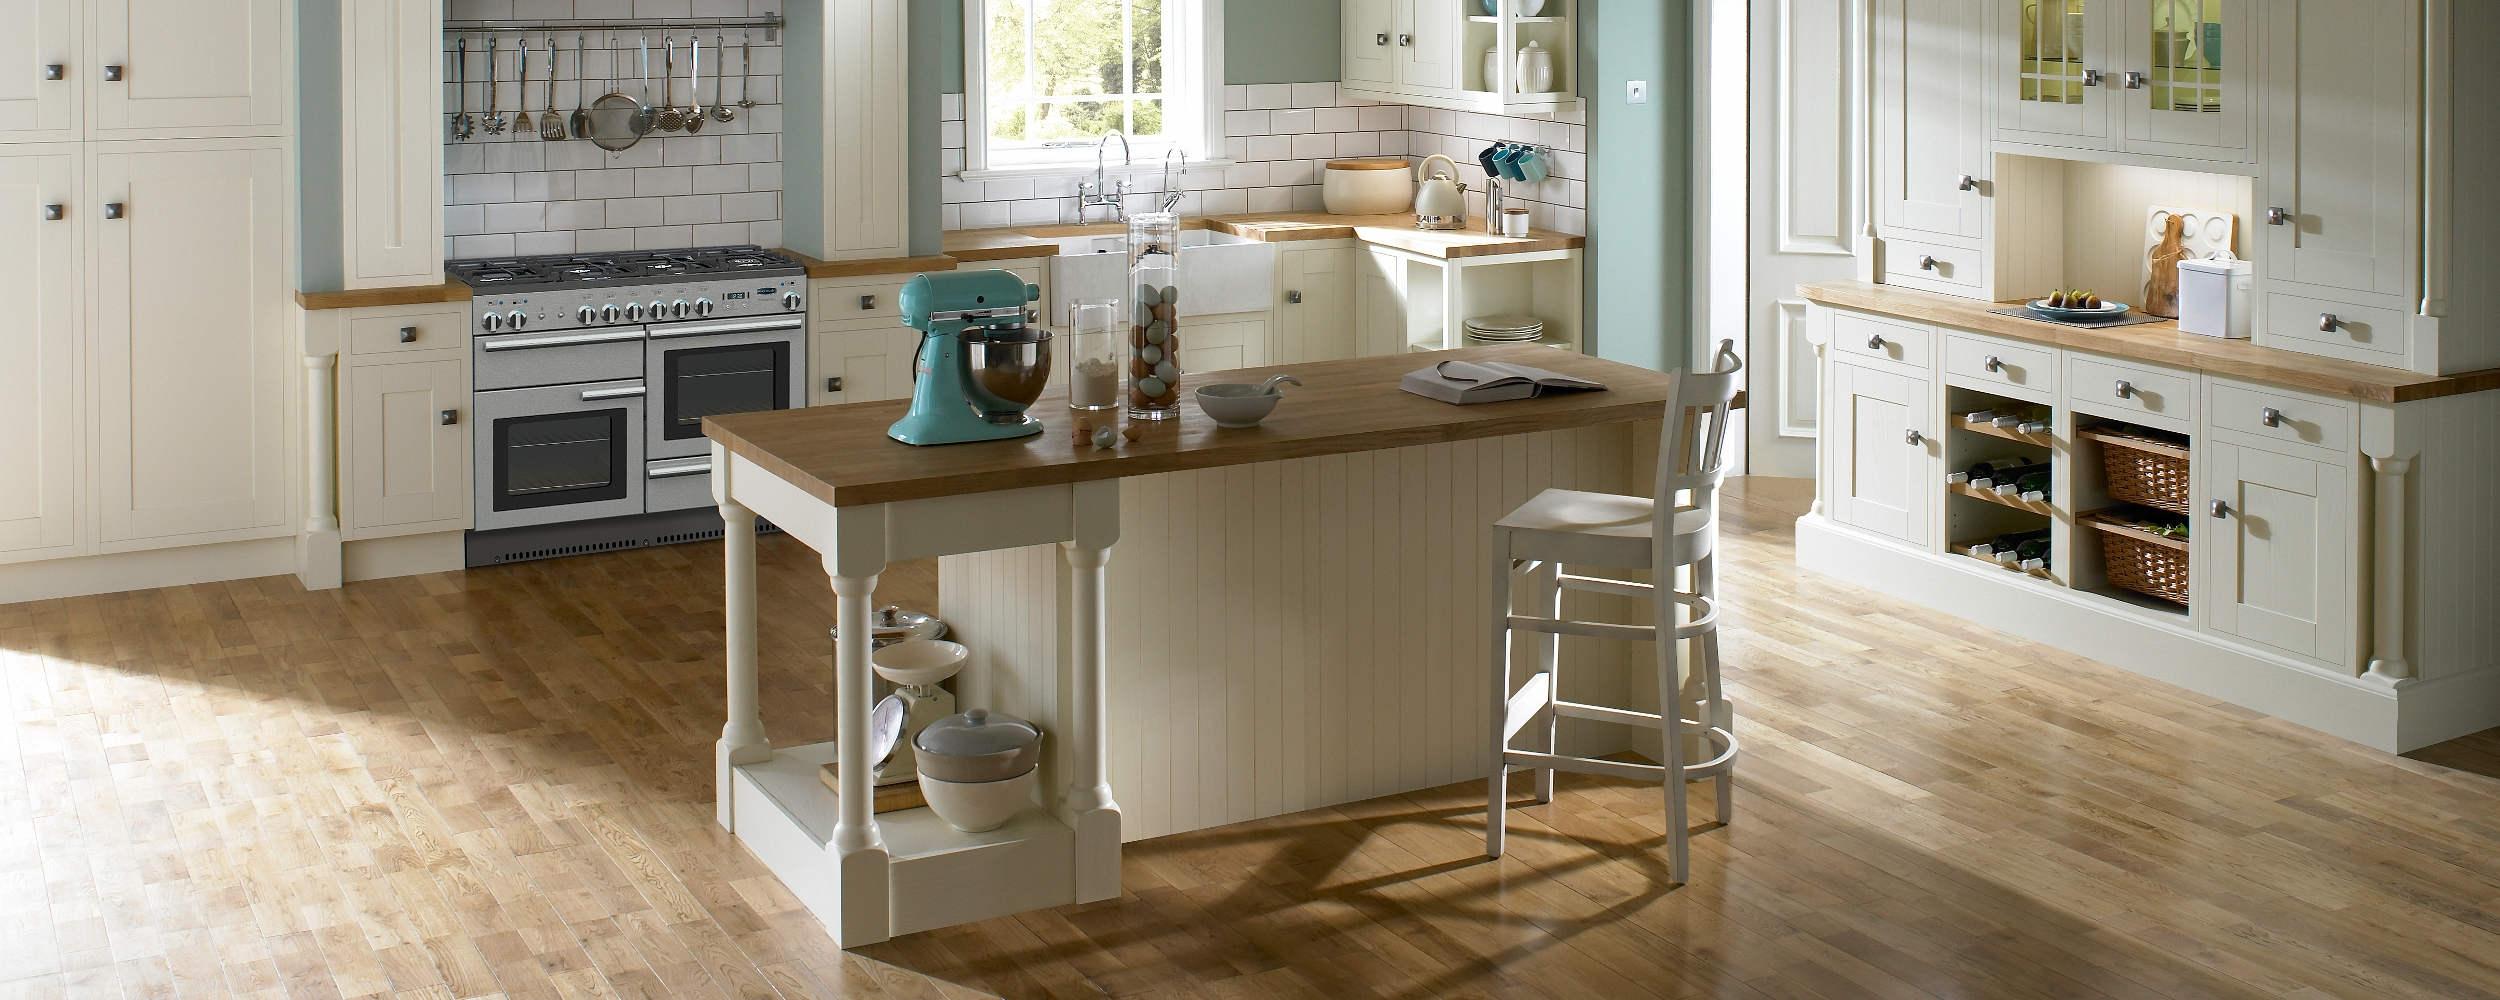 traditional-kitchen-design